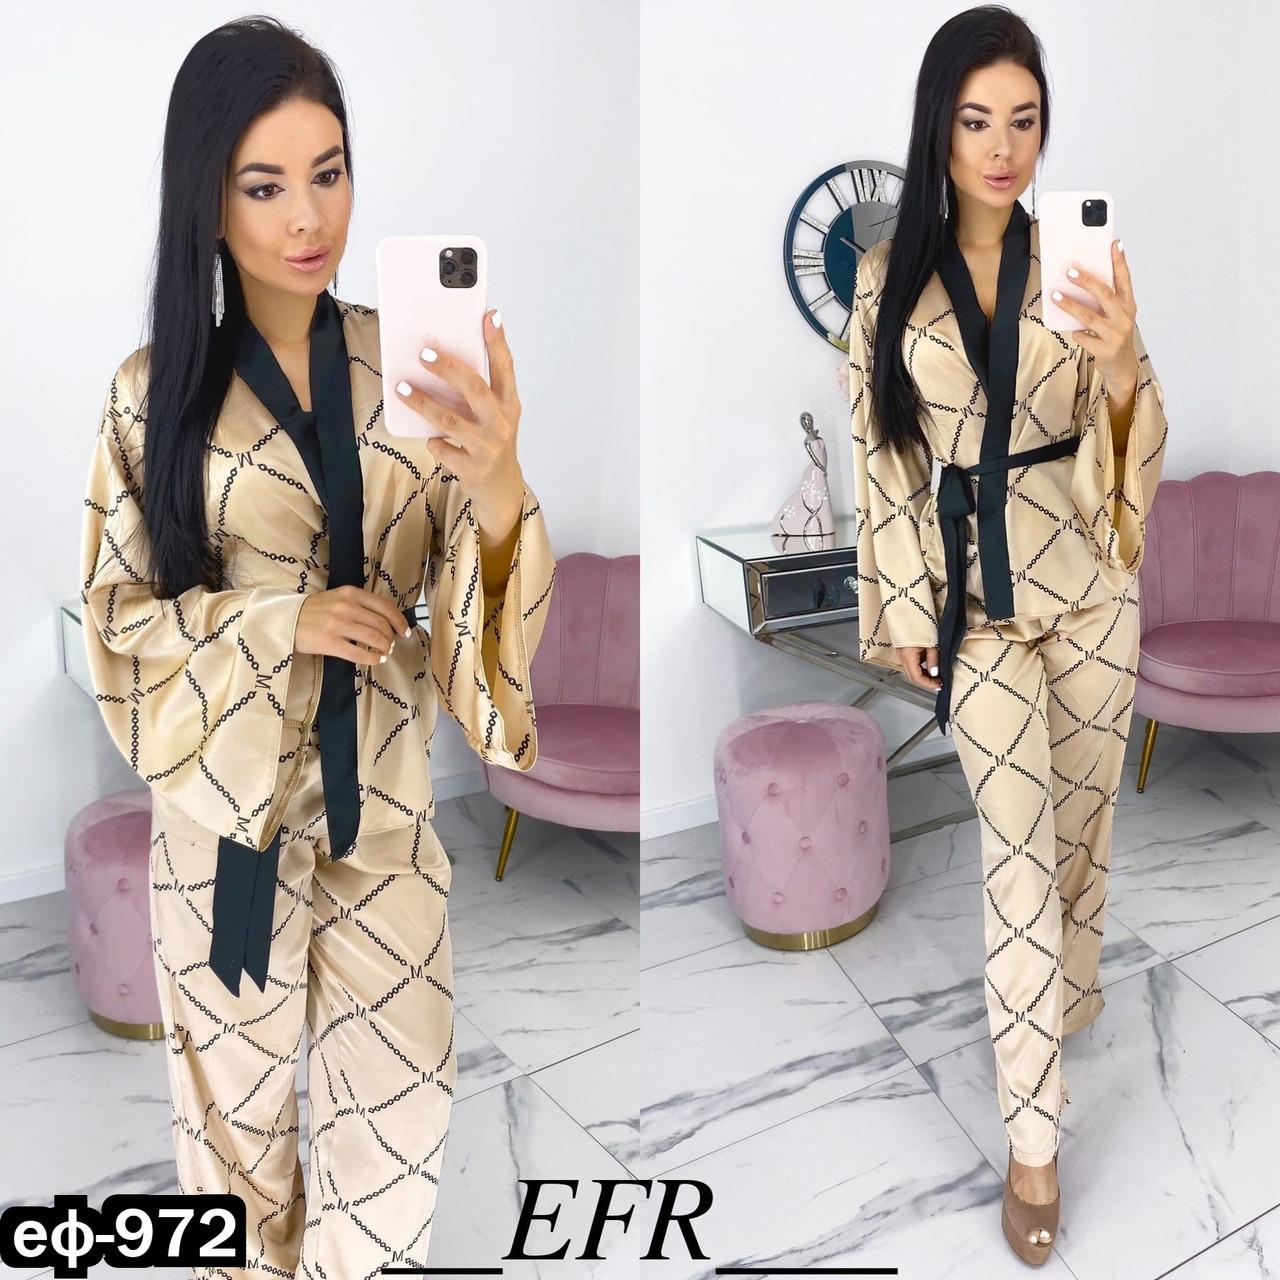 Женская стильная шелковая пижама 2 цвета